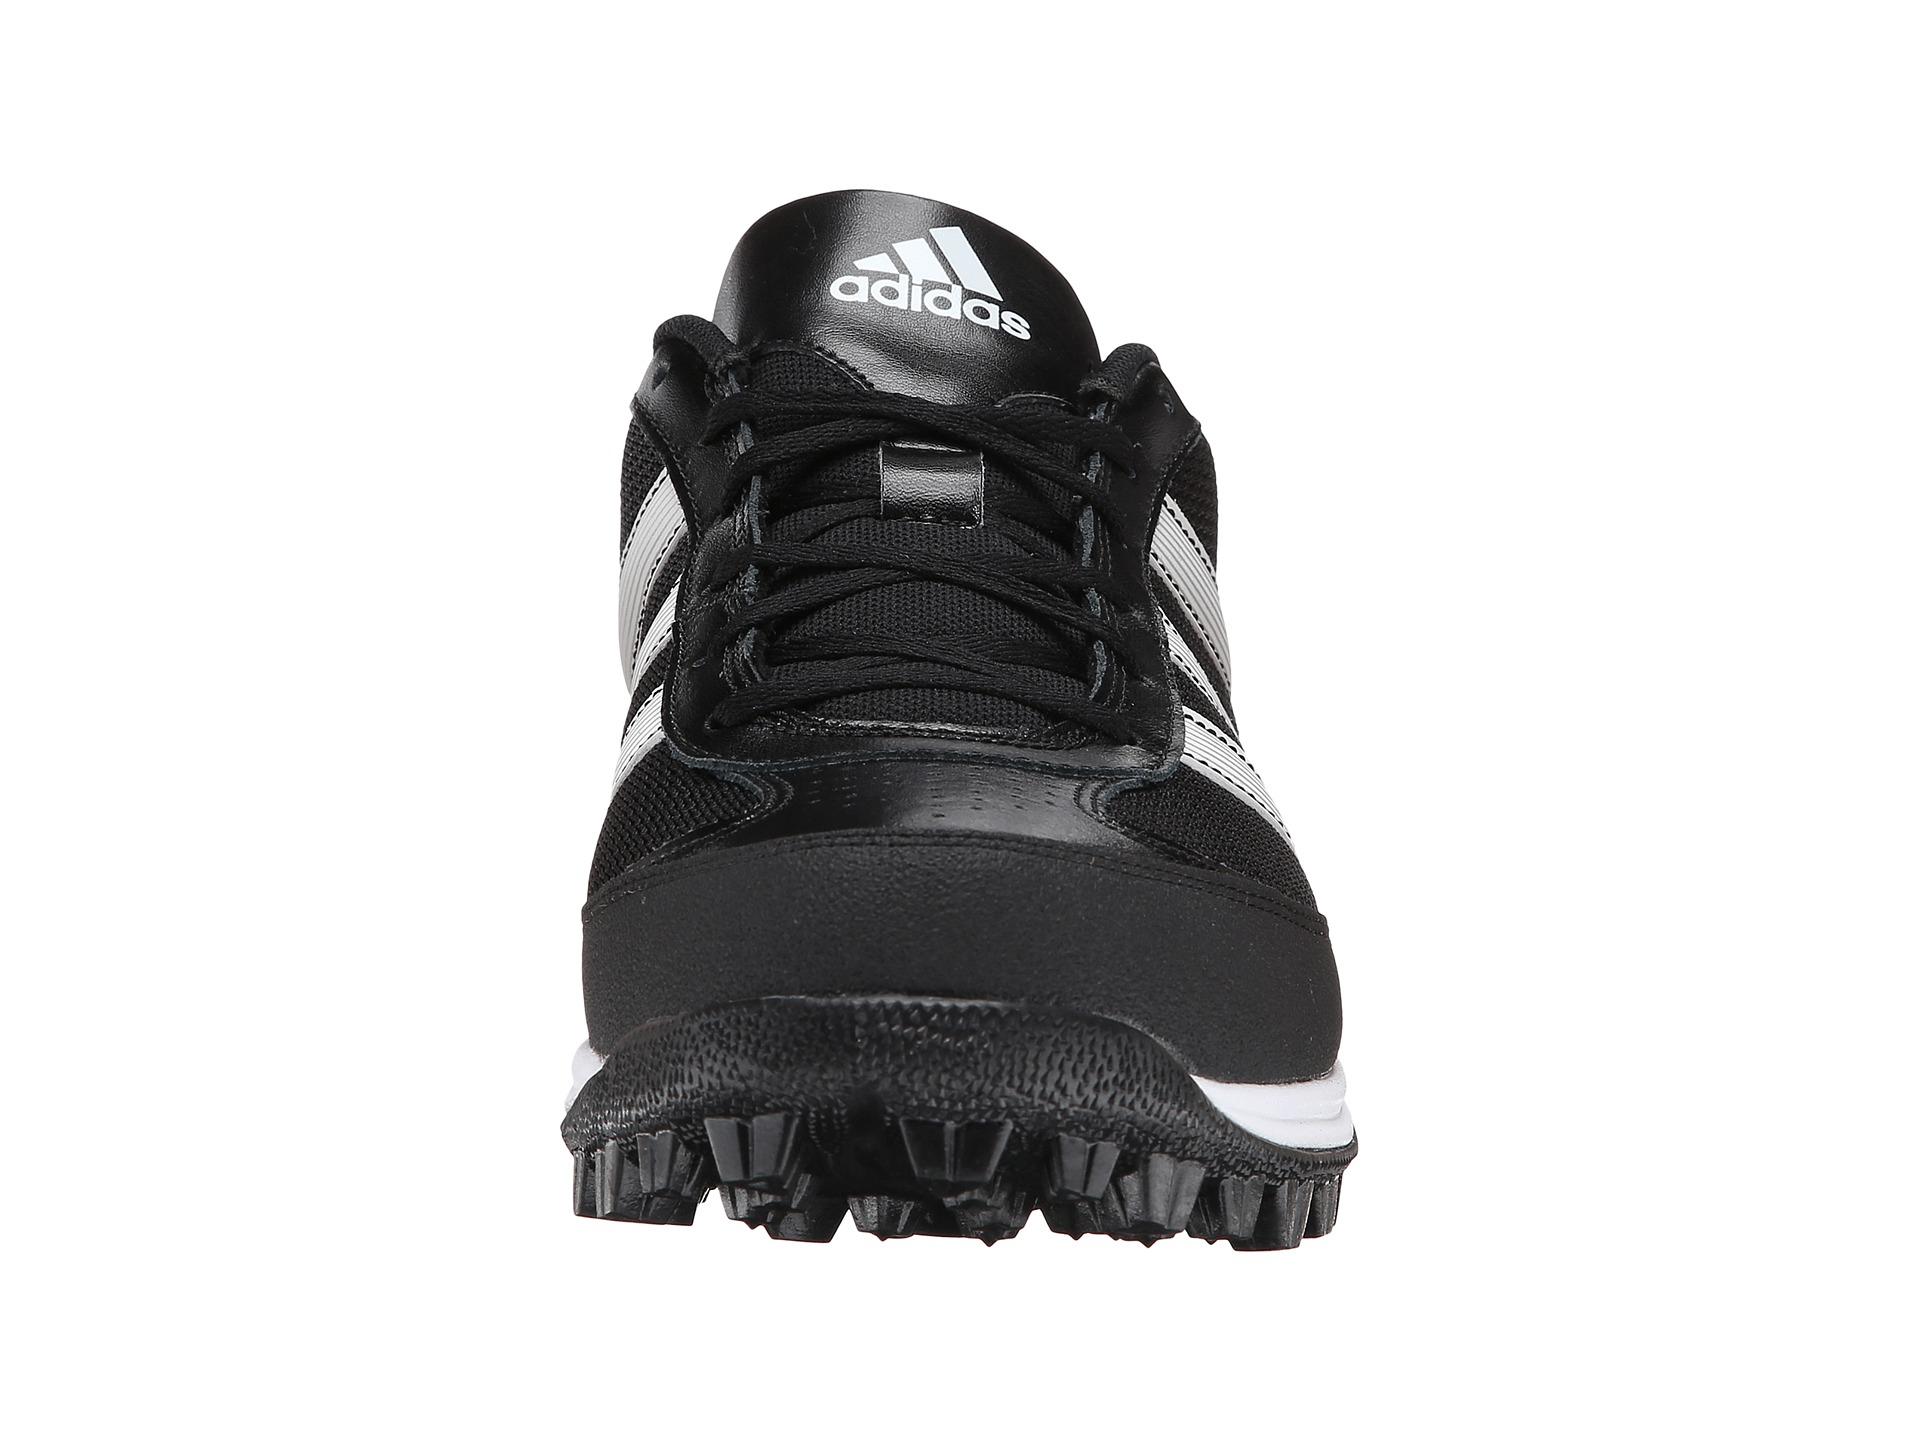 c6171078342 adidas Originals Turf Hog Lx Low - Baseball in Black for Men - Lyst